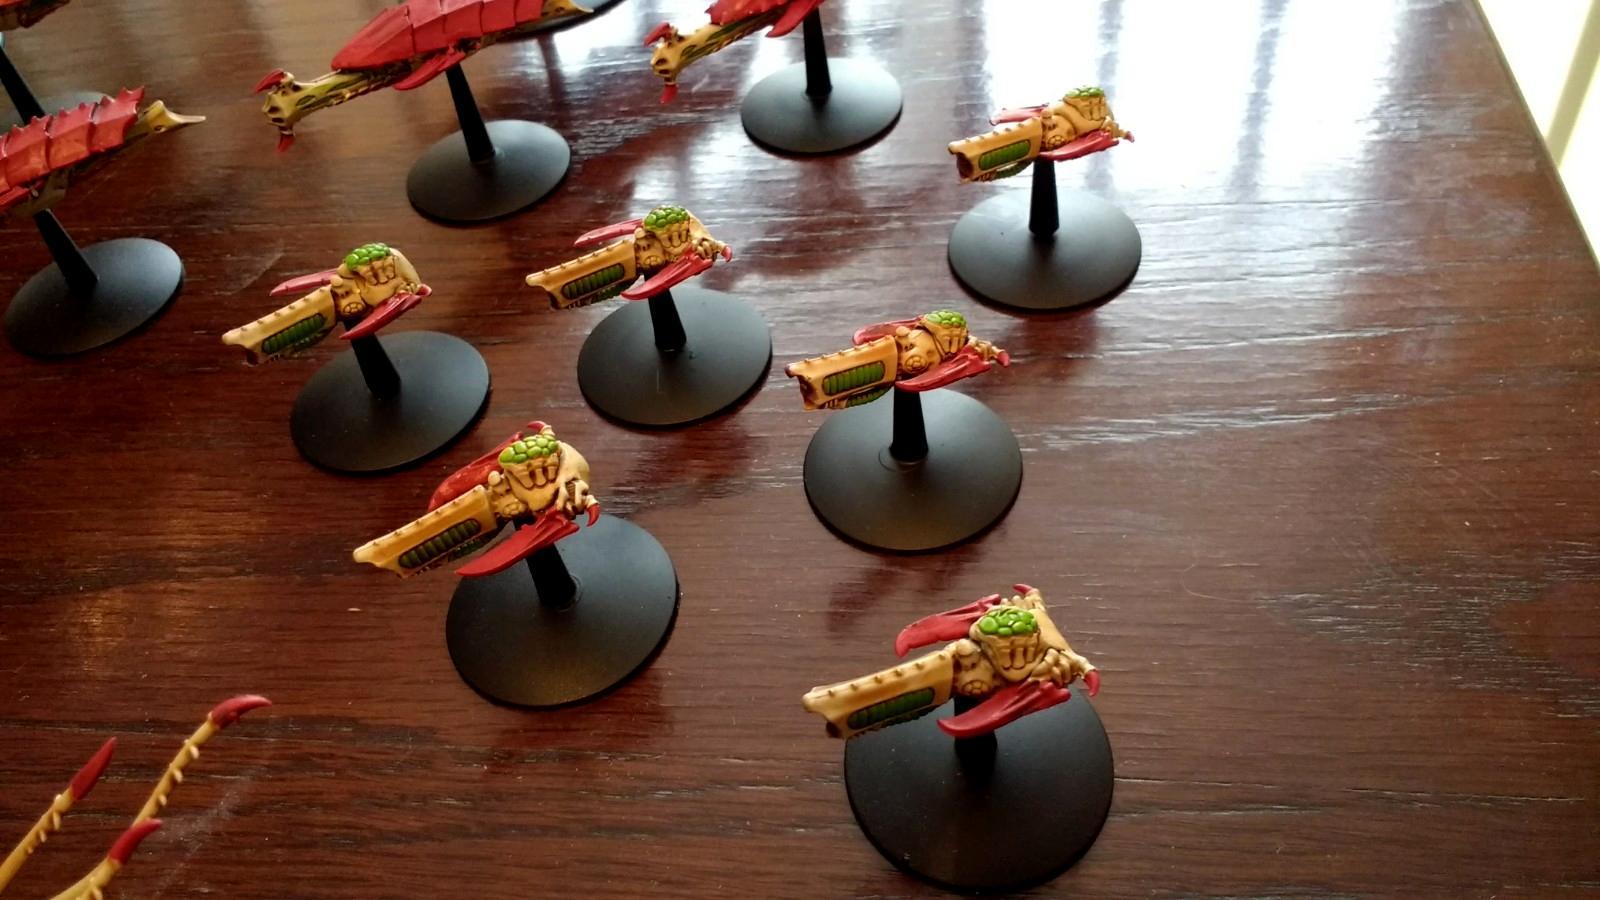 Battlefleet Gothic, Hive Fleet, Kraken, Tyranids